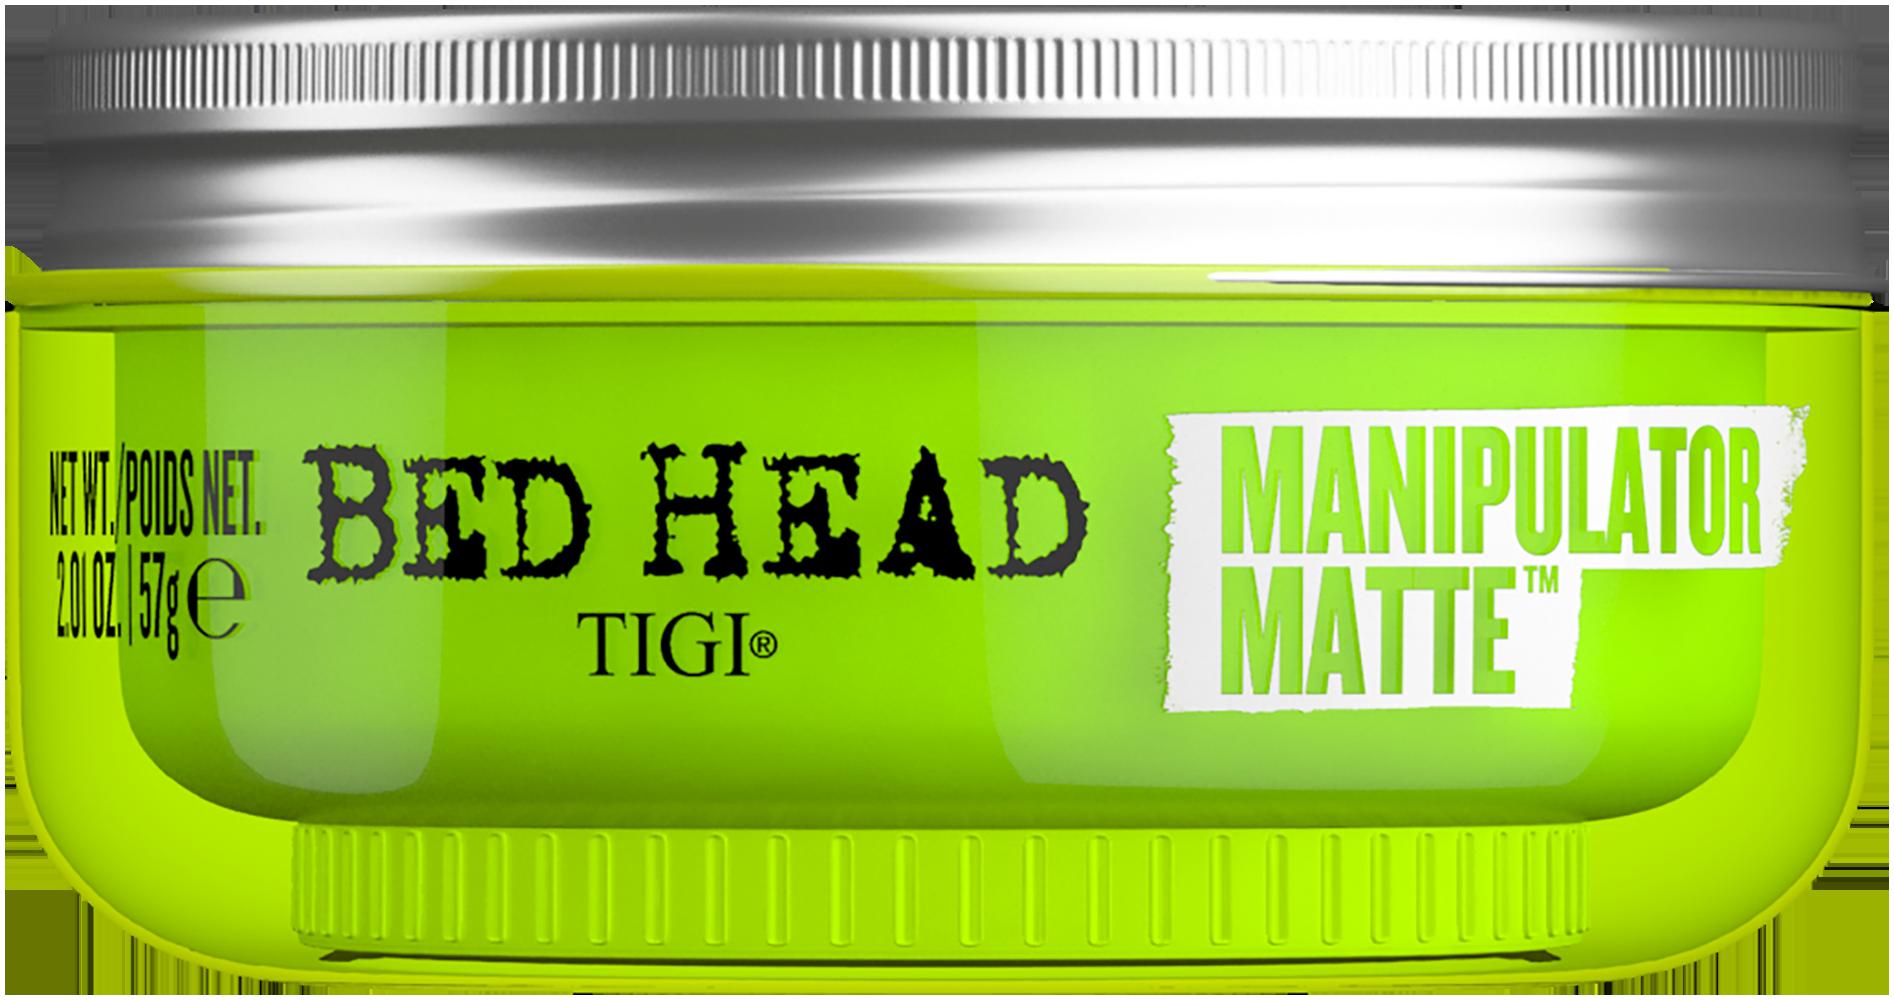 Manipulator Matte Front